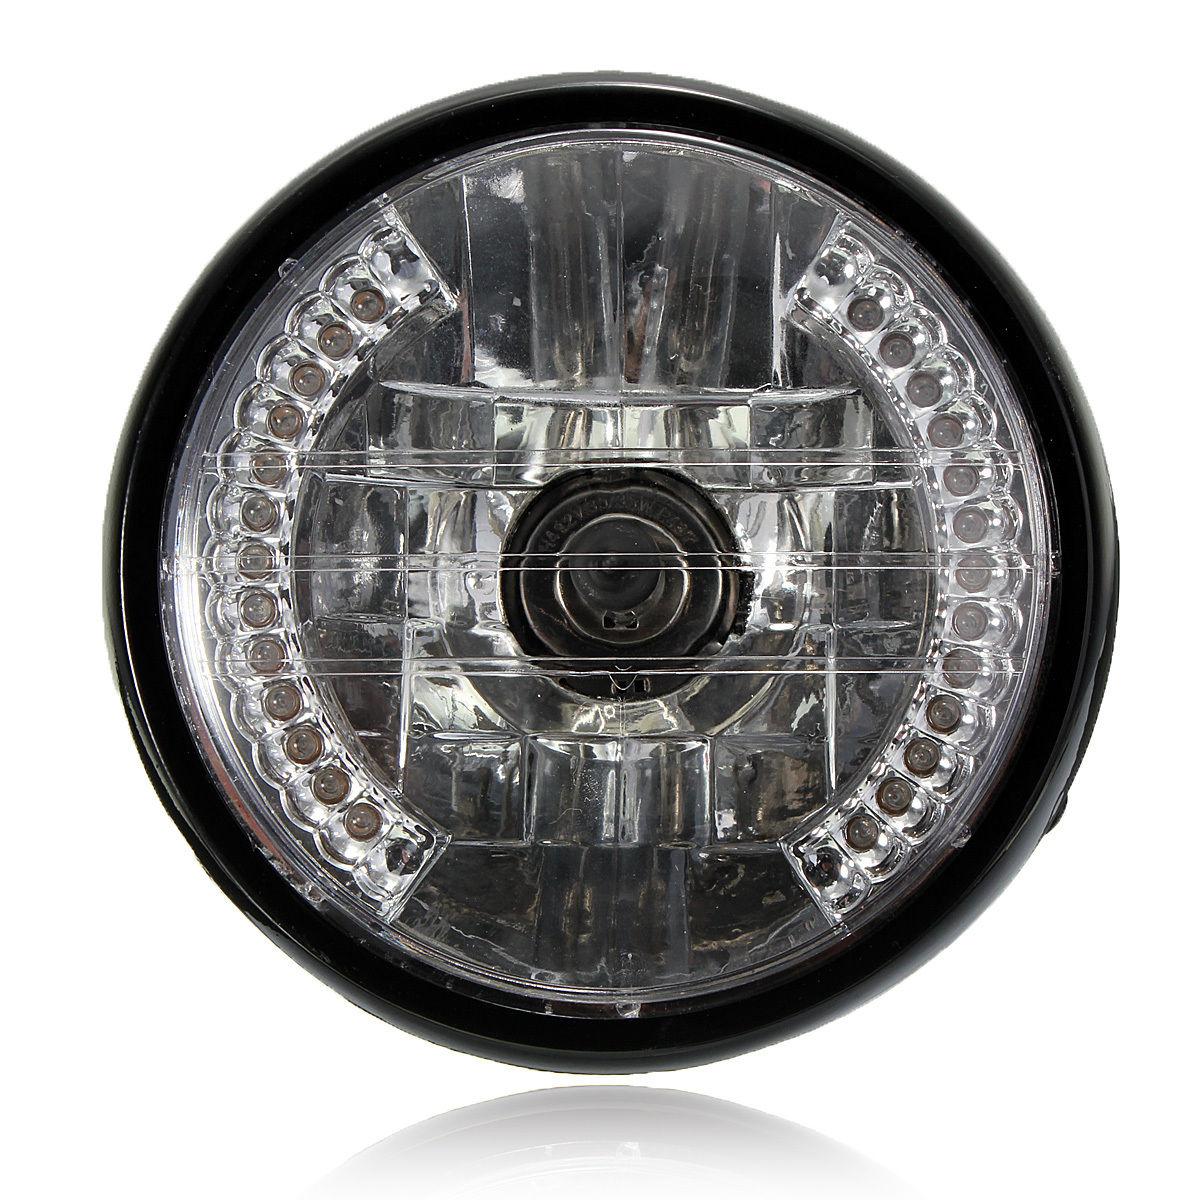 H4 Headlight Bulb Plug And Wiring